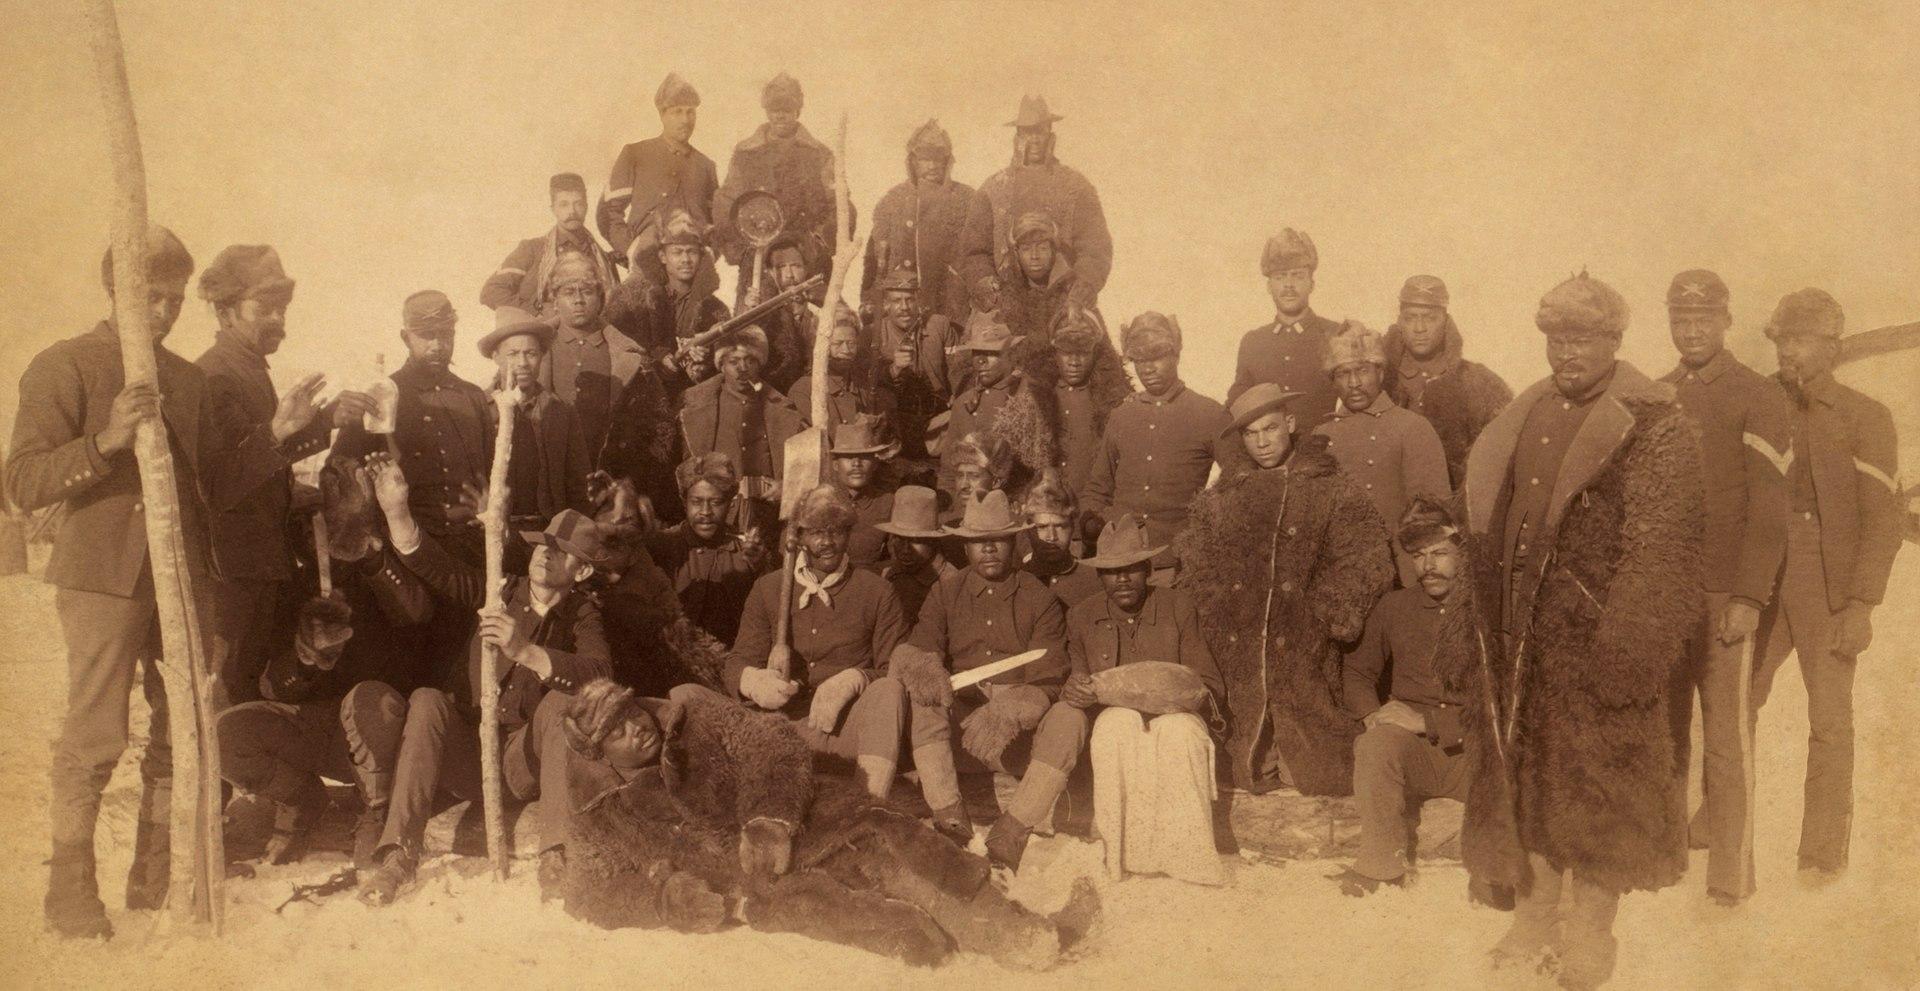 1920px-Buffalo_soldiers1.jpg